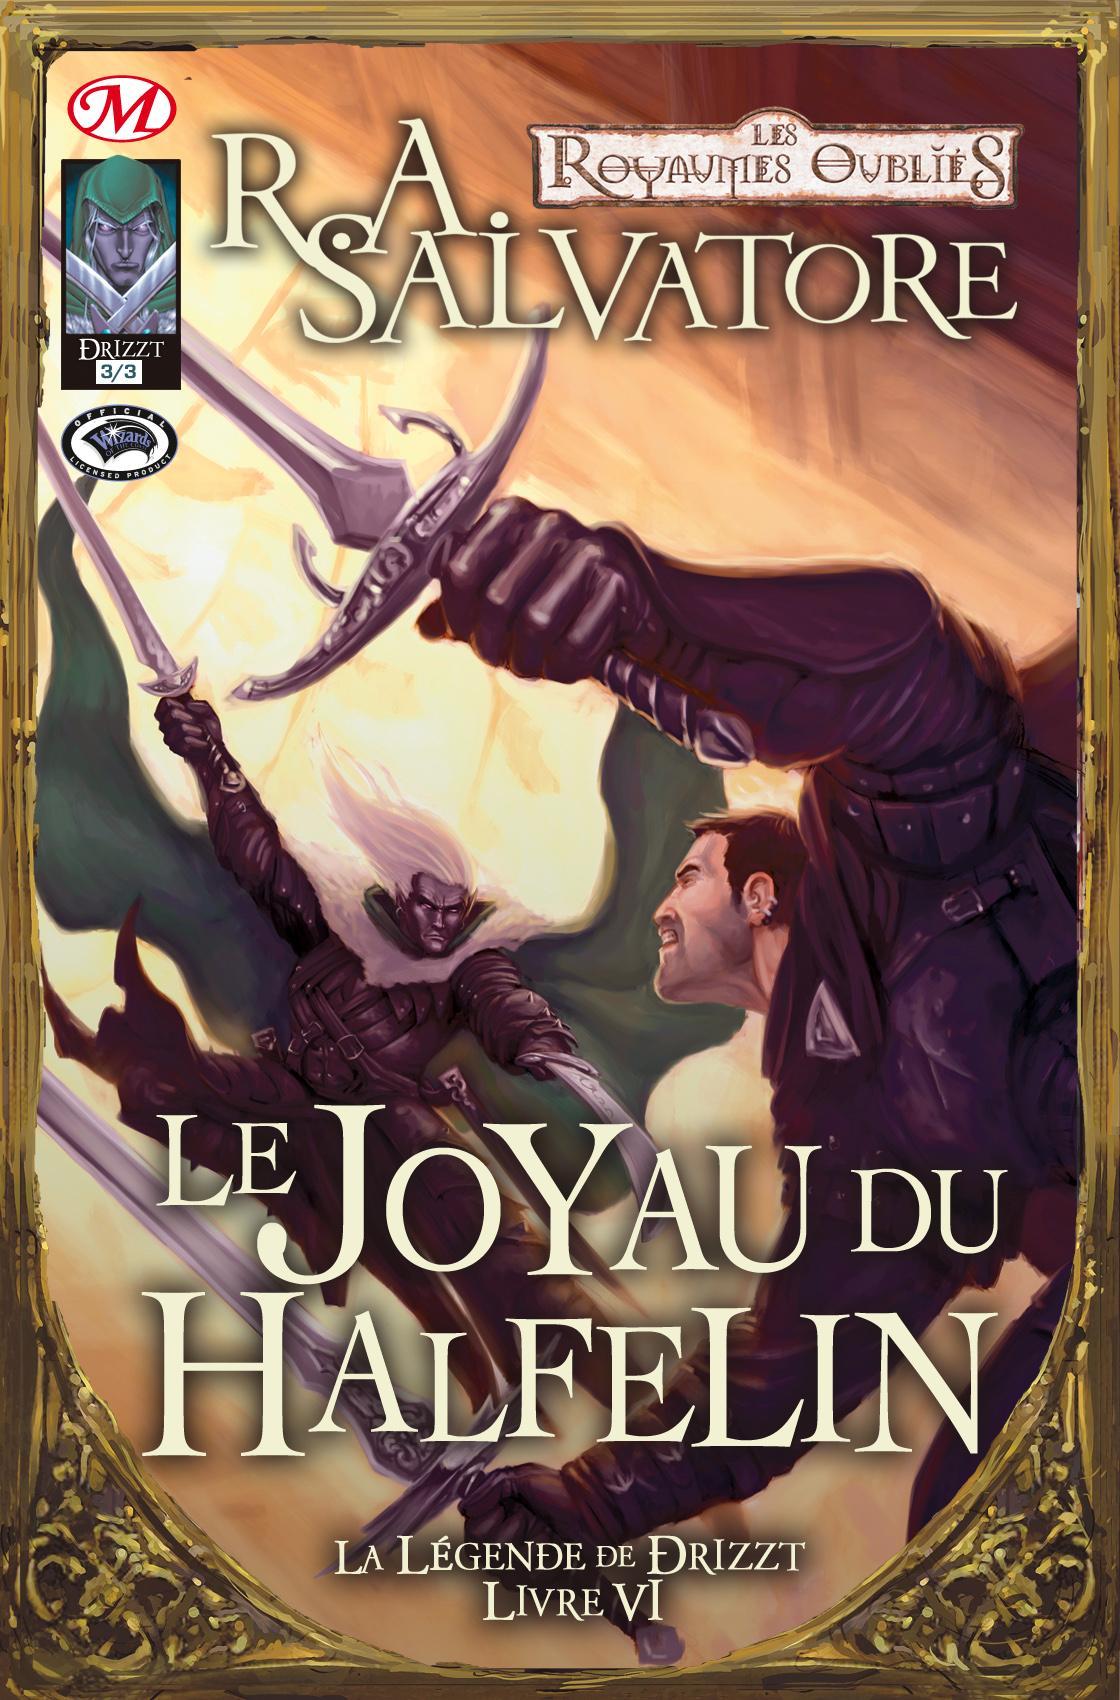 Le Joyau du halfelin 3/3, LA LÉGENDE DE DRIZZT, T6